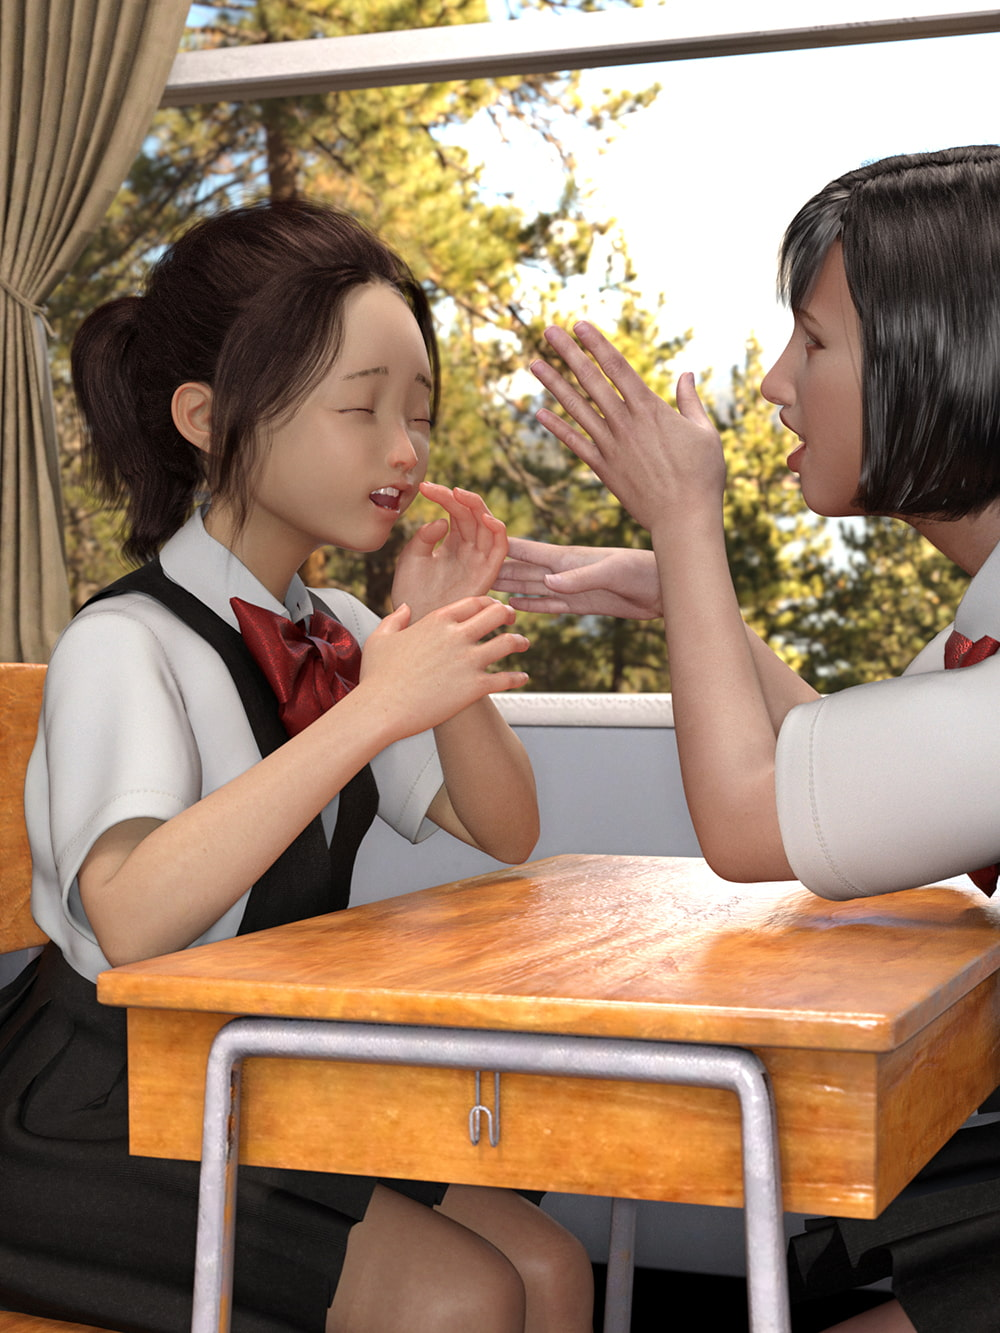 Japanese Cutie 〜露出癖が同級生にバレて人生詰んだ女子〜